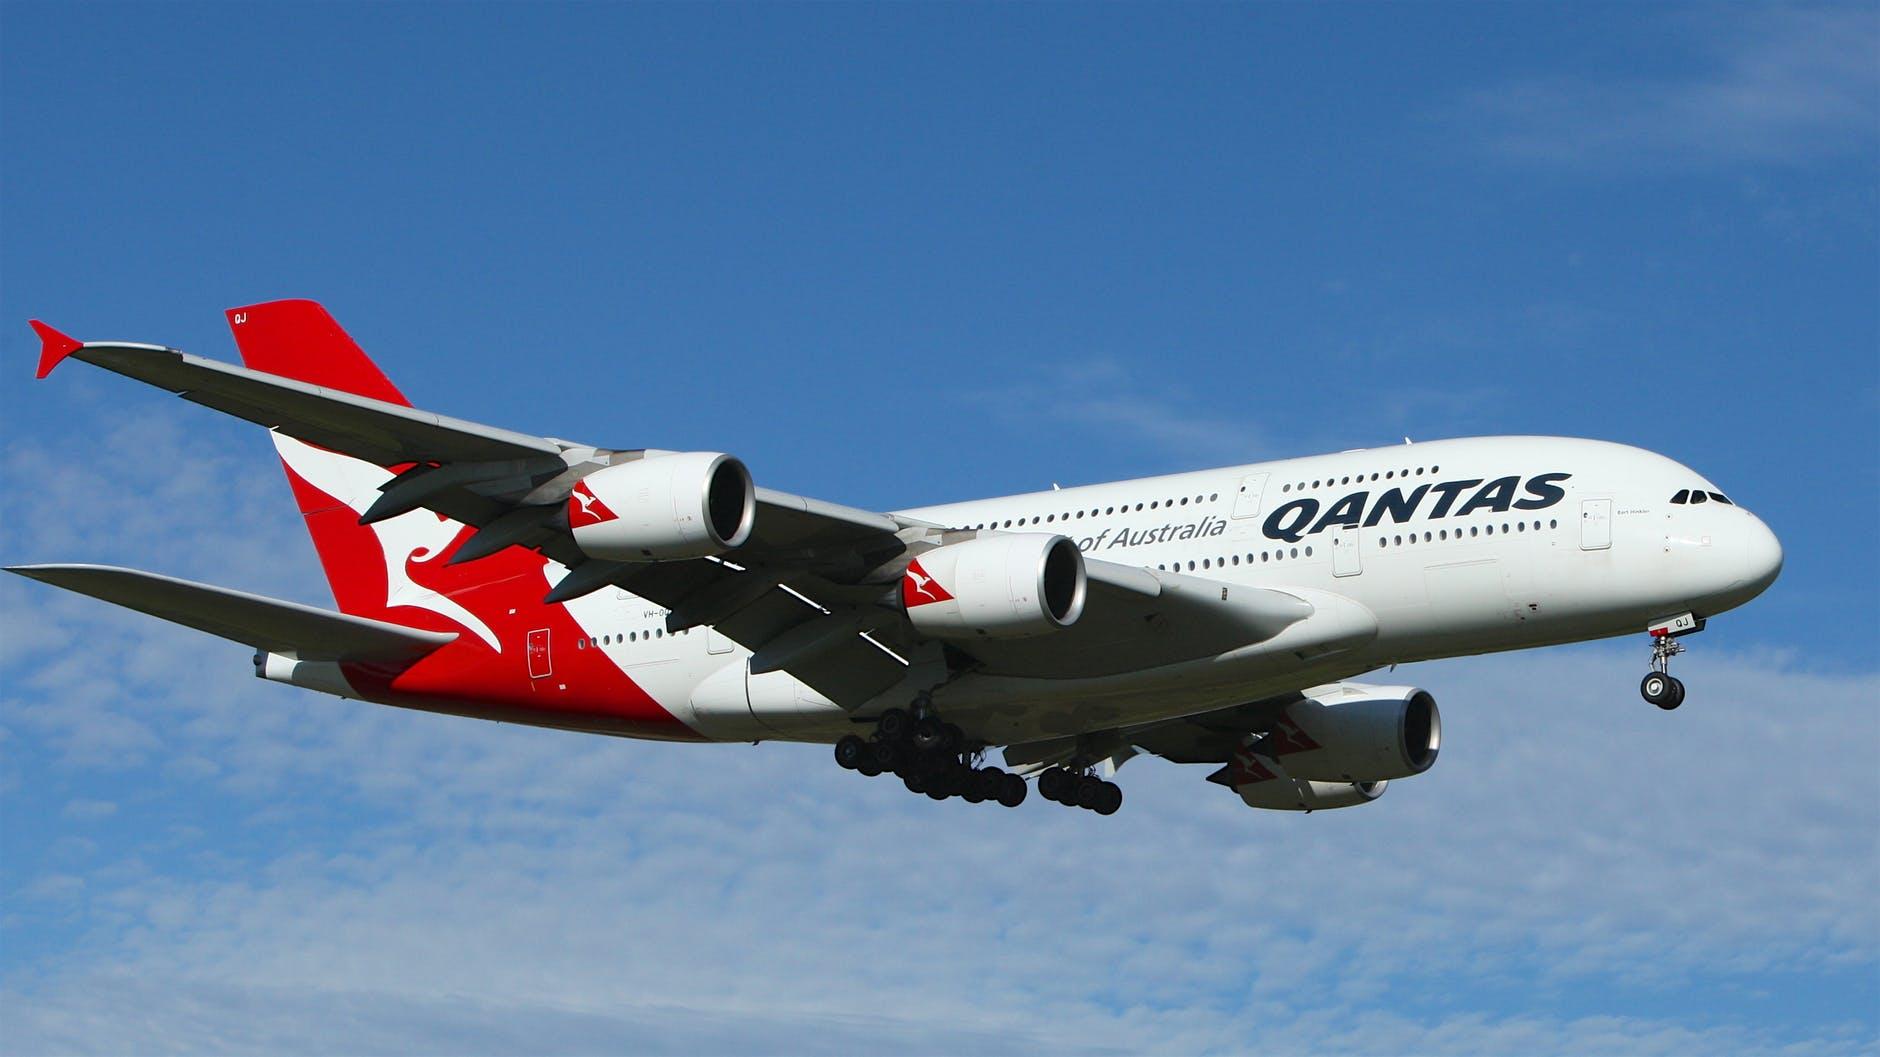 Strengths and Weaknesses of Qantas Airways